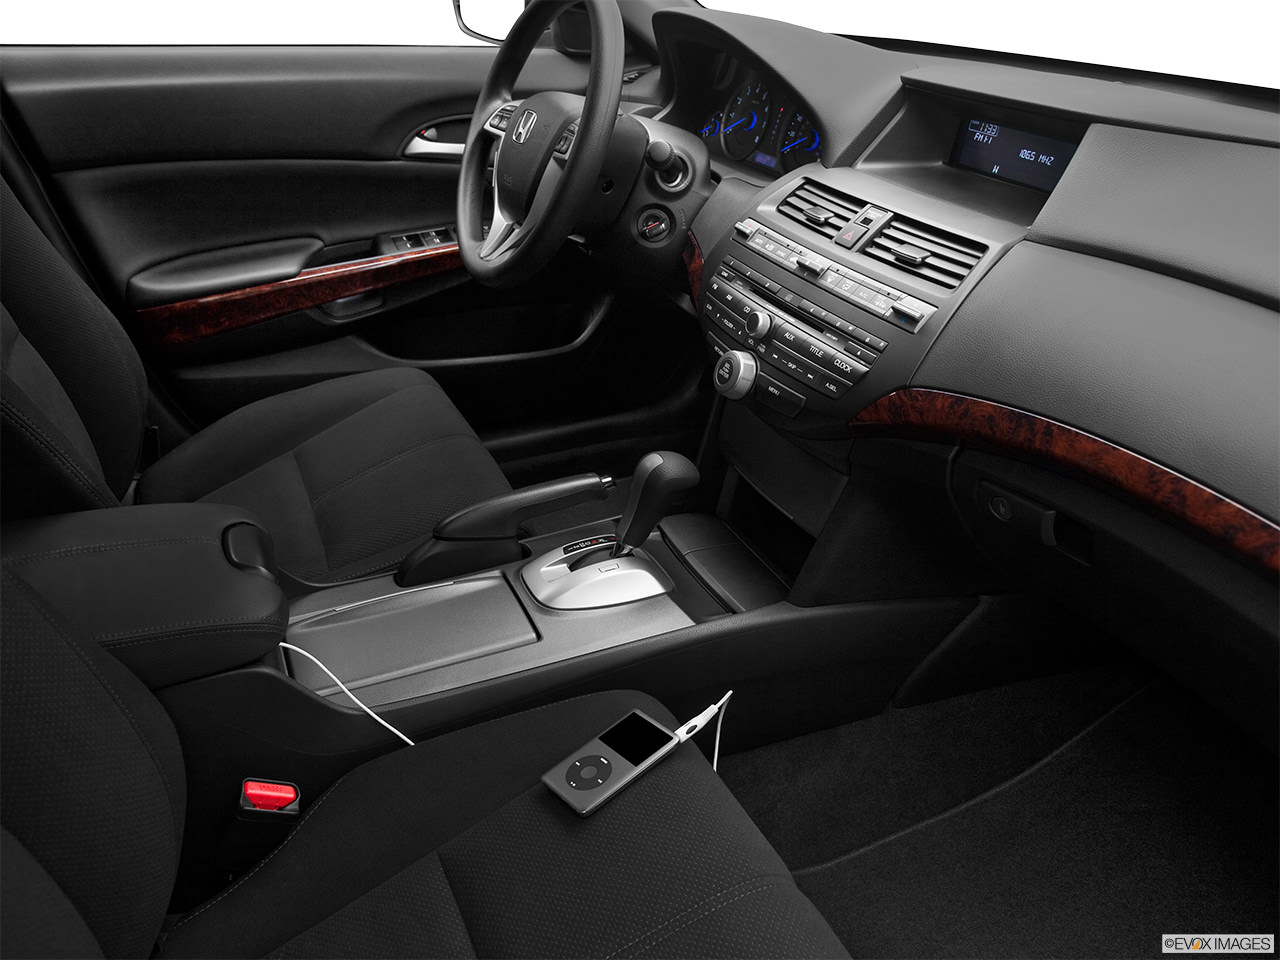 crosstour car bulbs kit honda interior com lights automotive amazon for led dp white